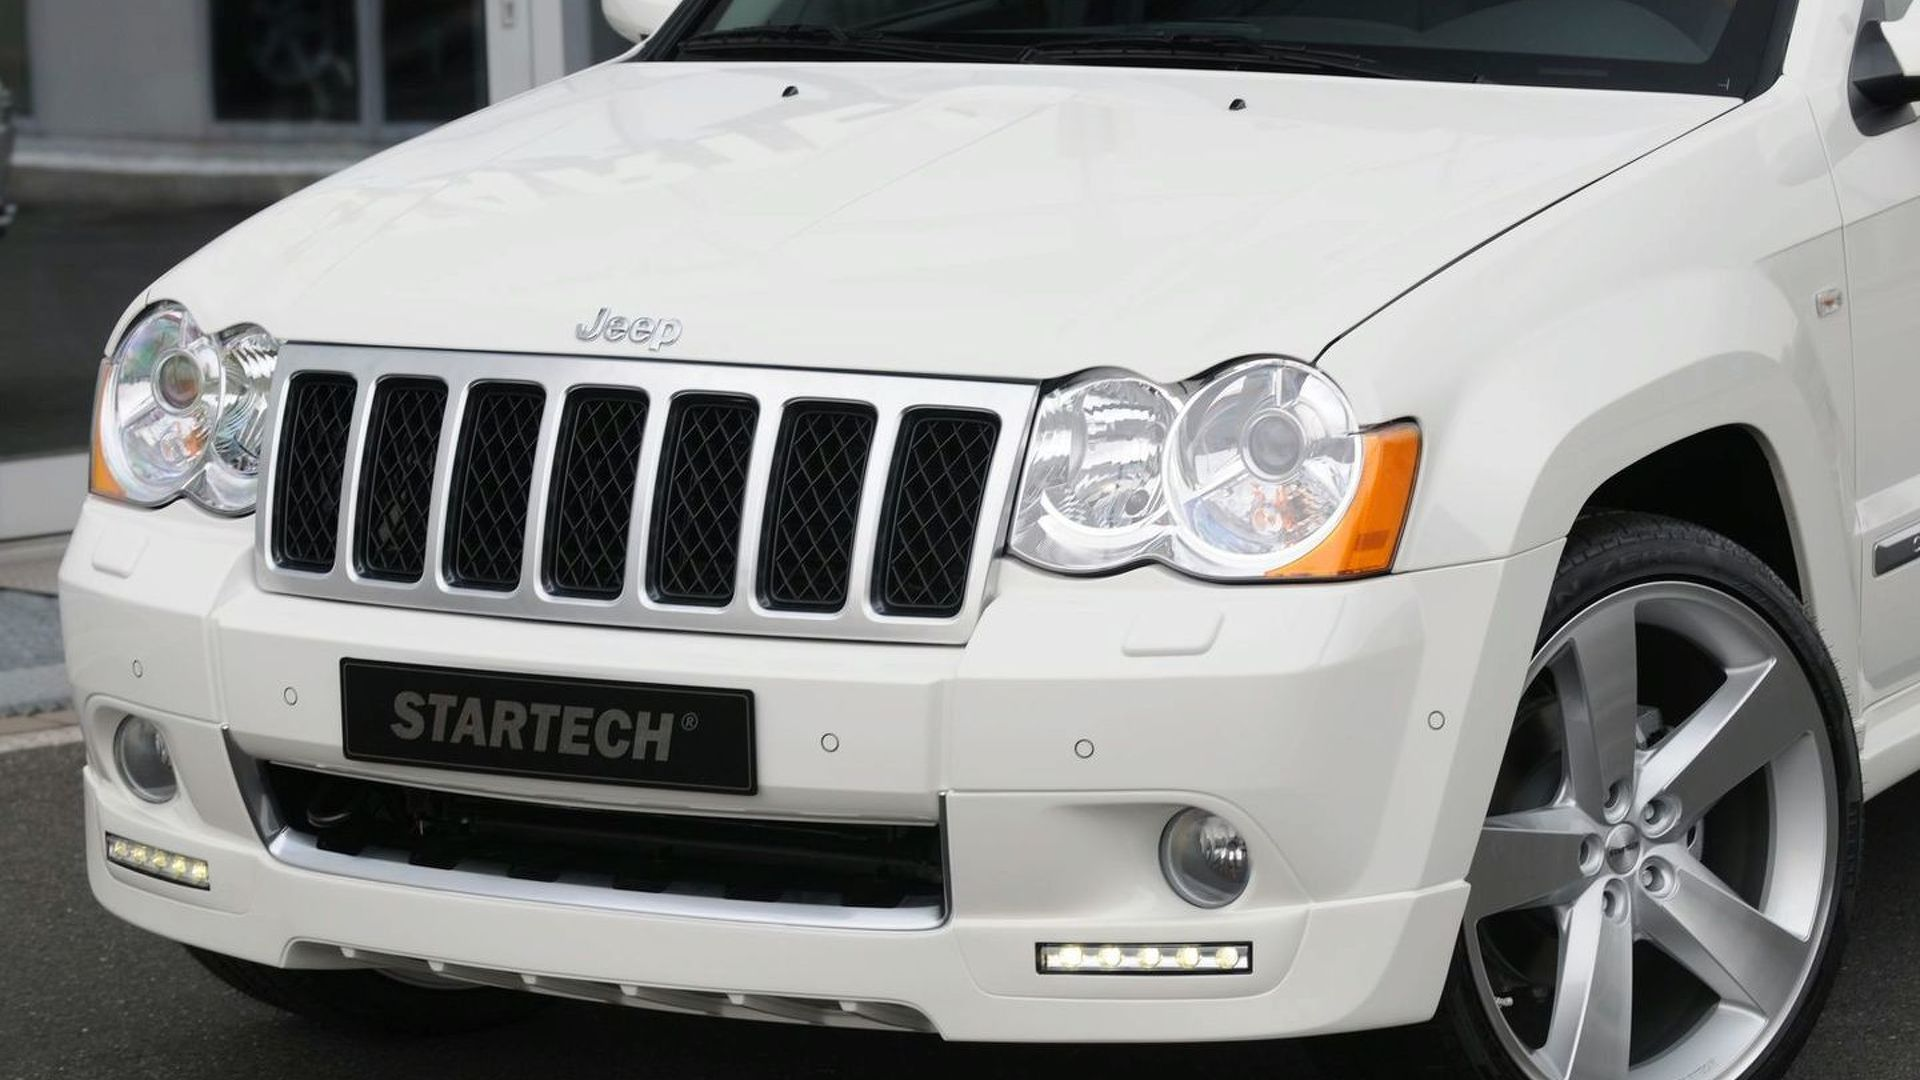 Startech Program For Jeep Grand Cherokee Overland